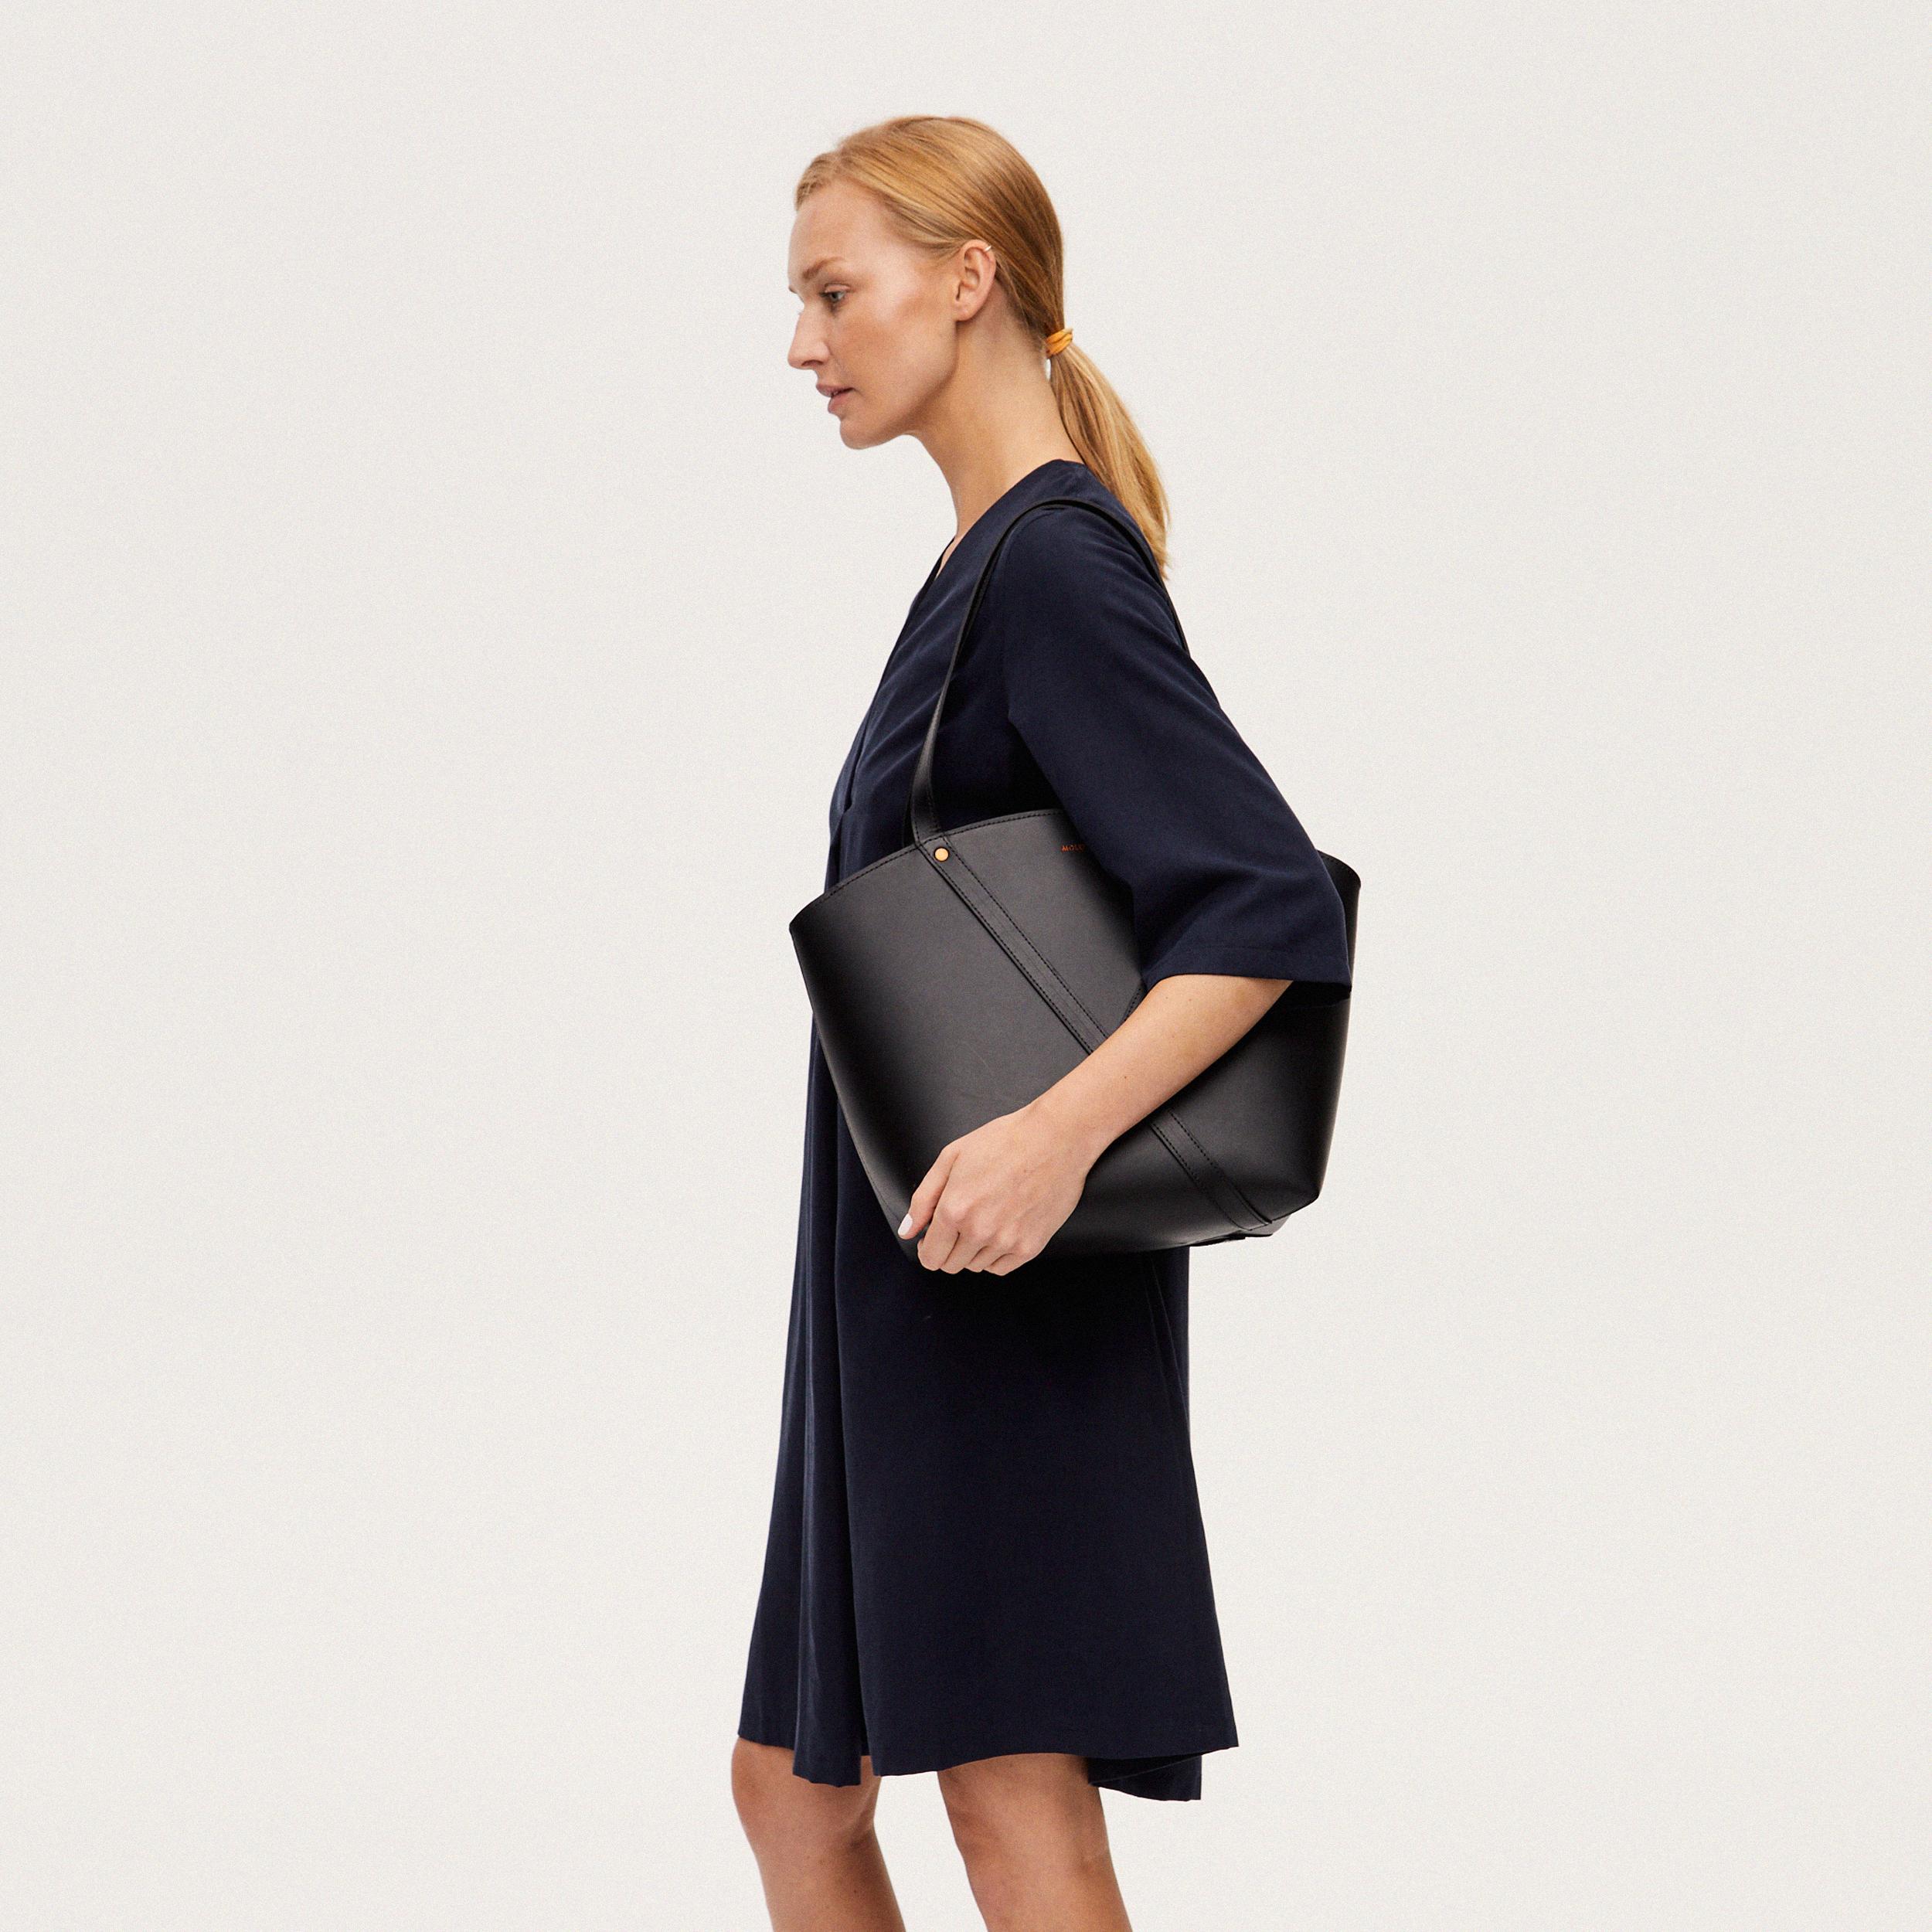 BONDIA Shopper Bag Black-look-2